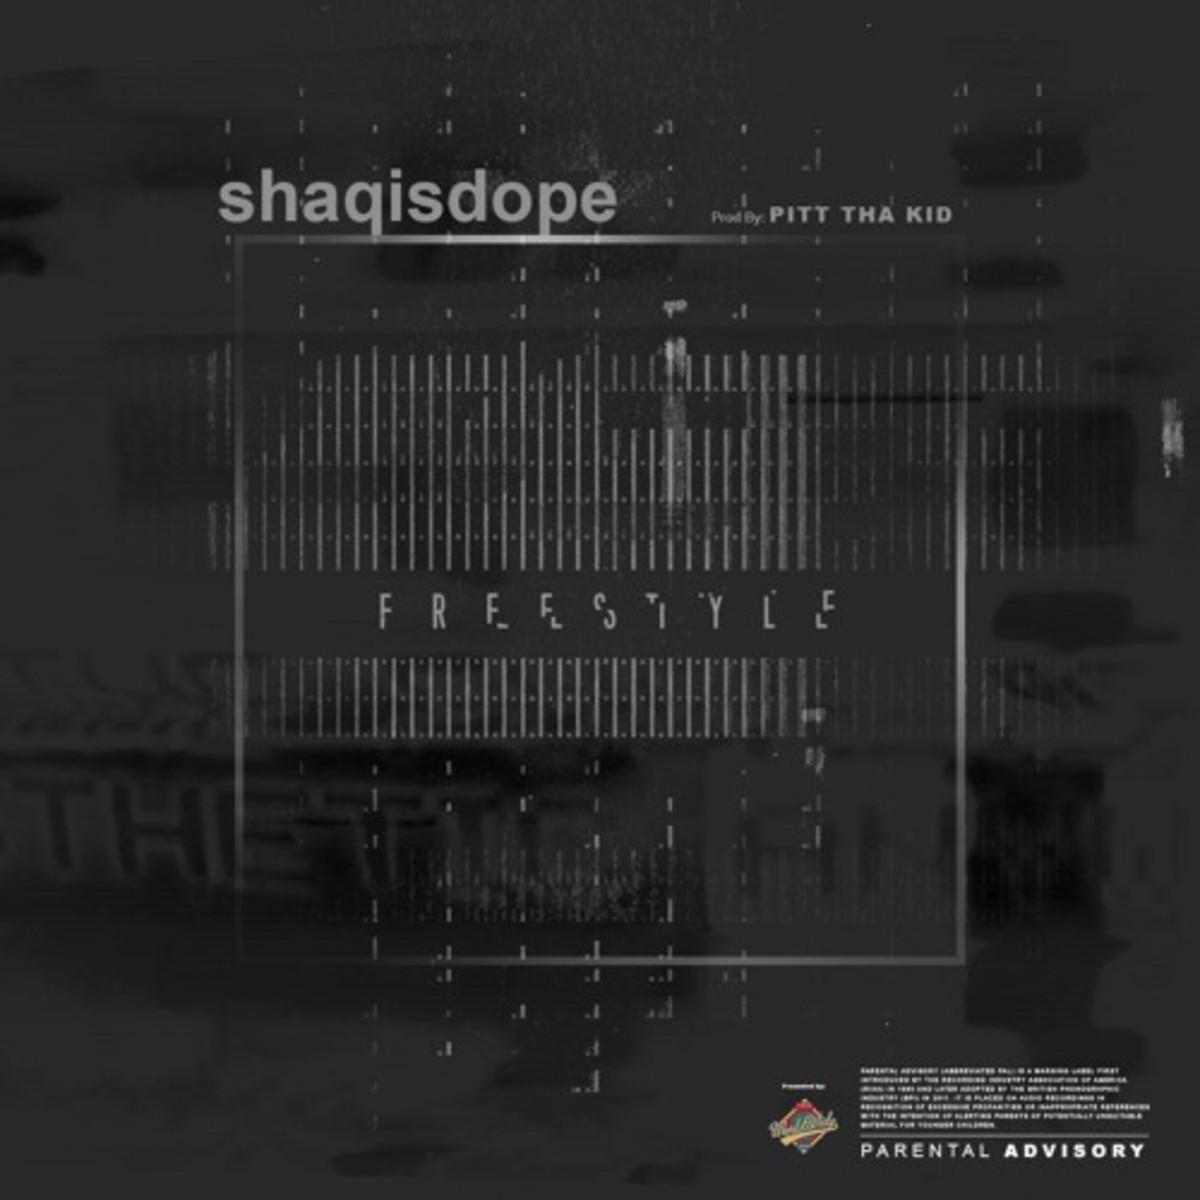 shaqisdope-black-frames-freestyle.jpg